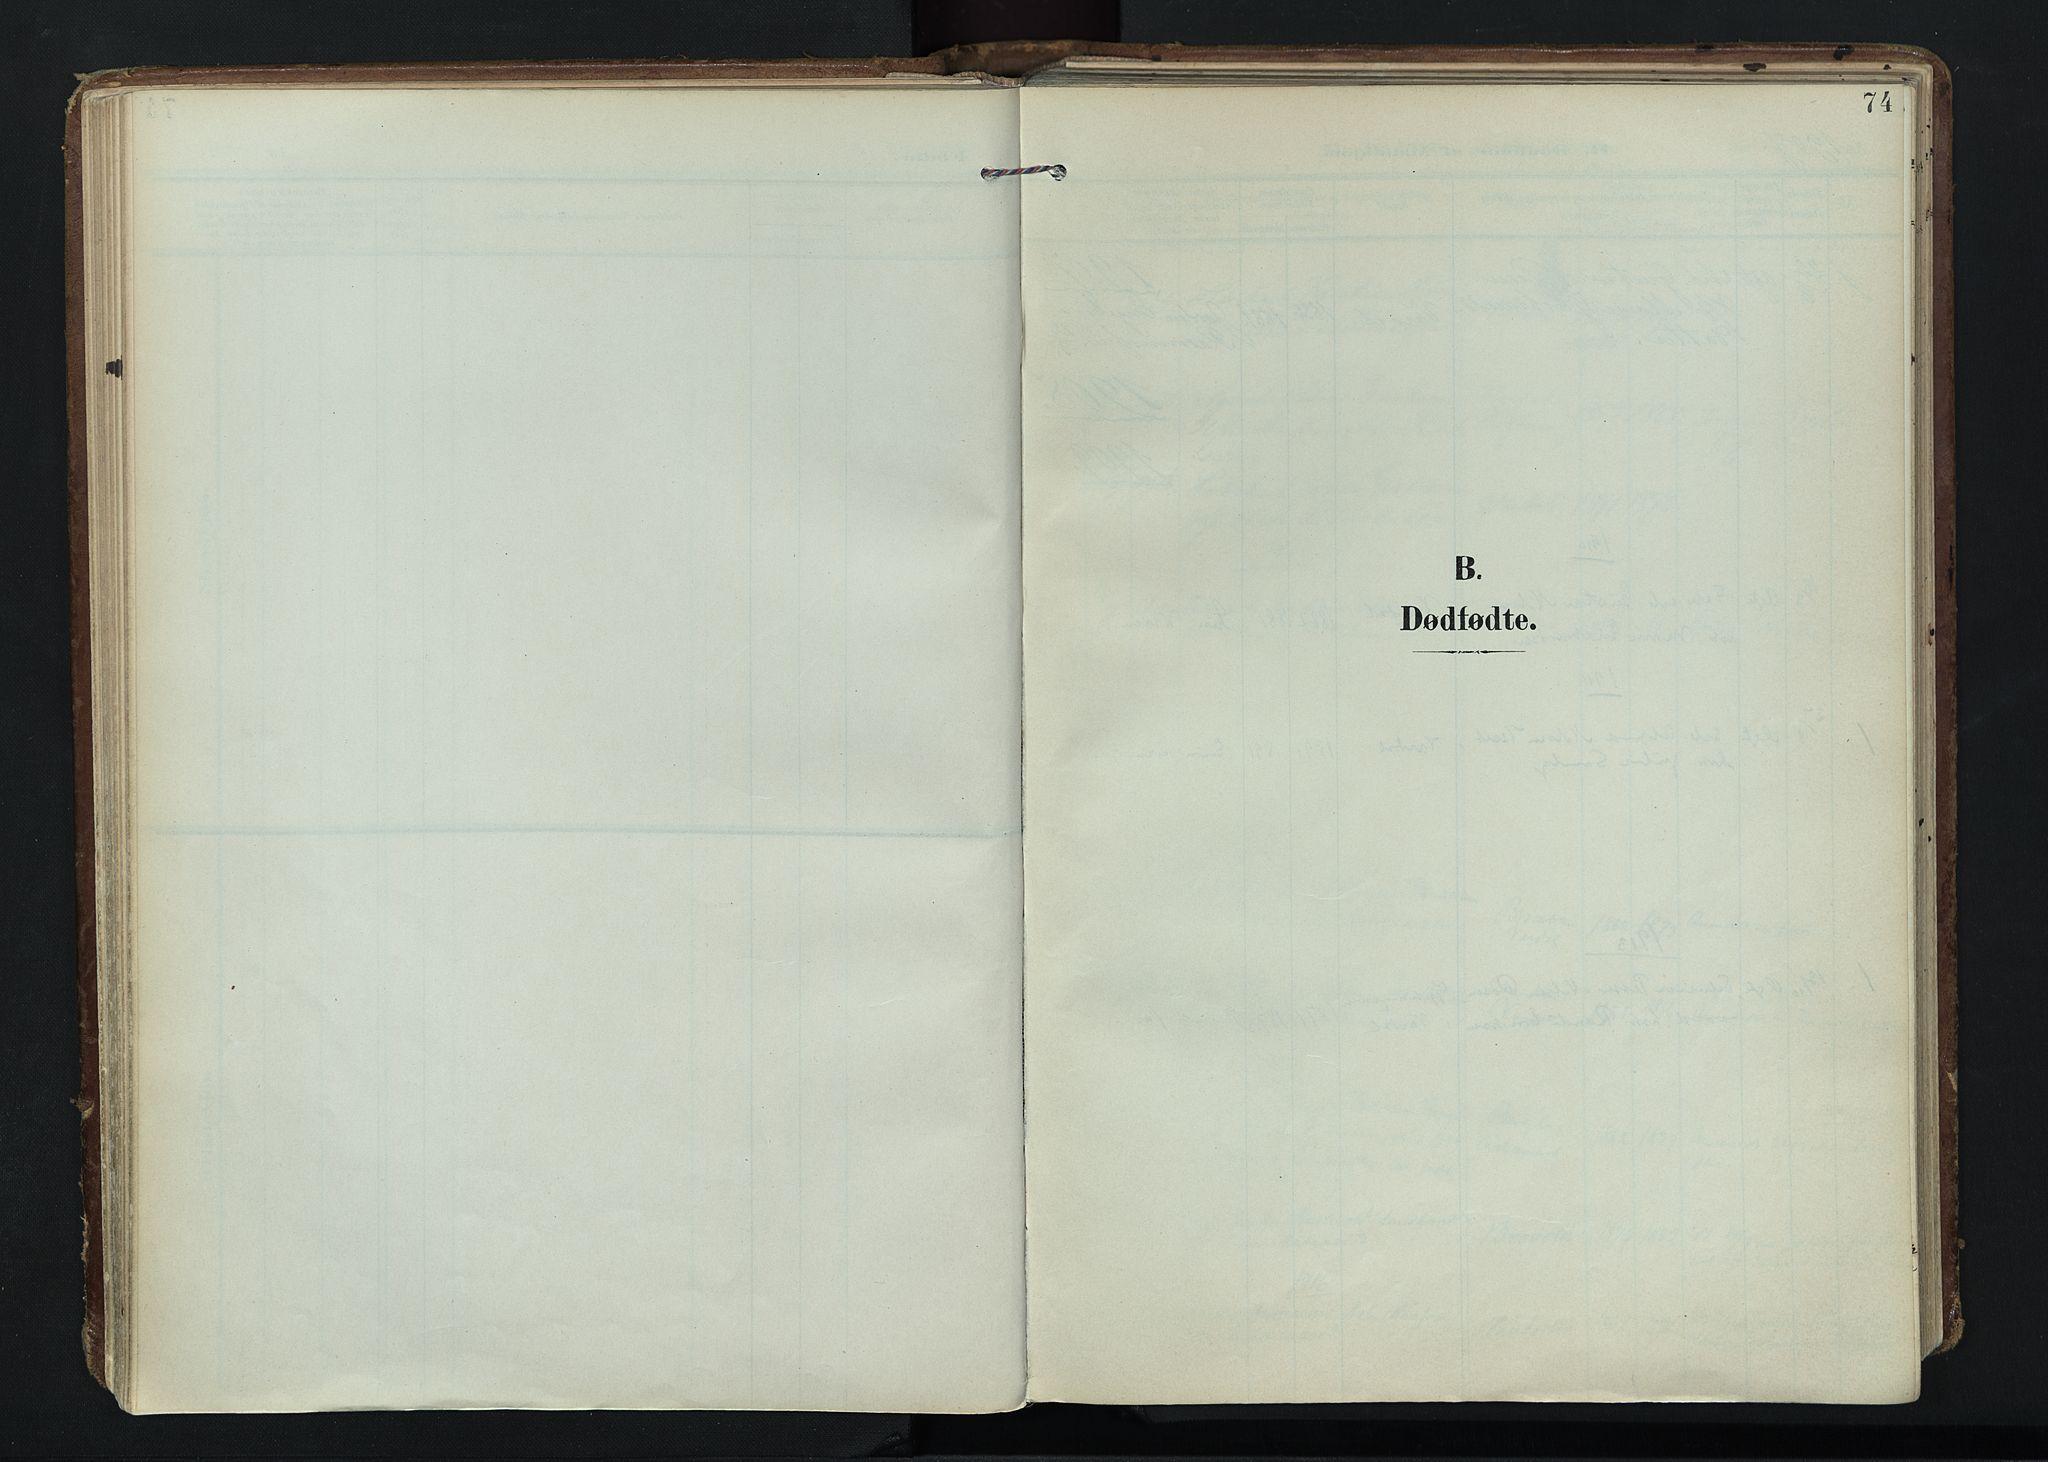 SAH, Vardal prestekontor, H/Ha/Haa/L0020: Ministerialbok nr. 20, 1907-1921, s. 74